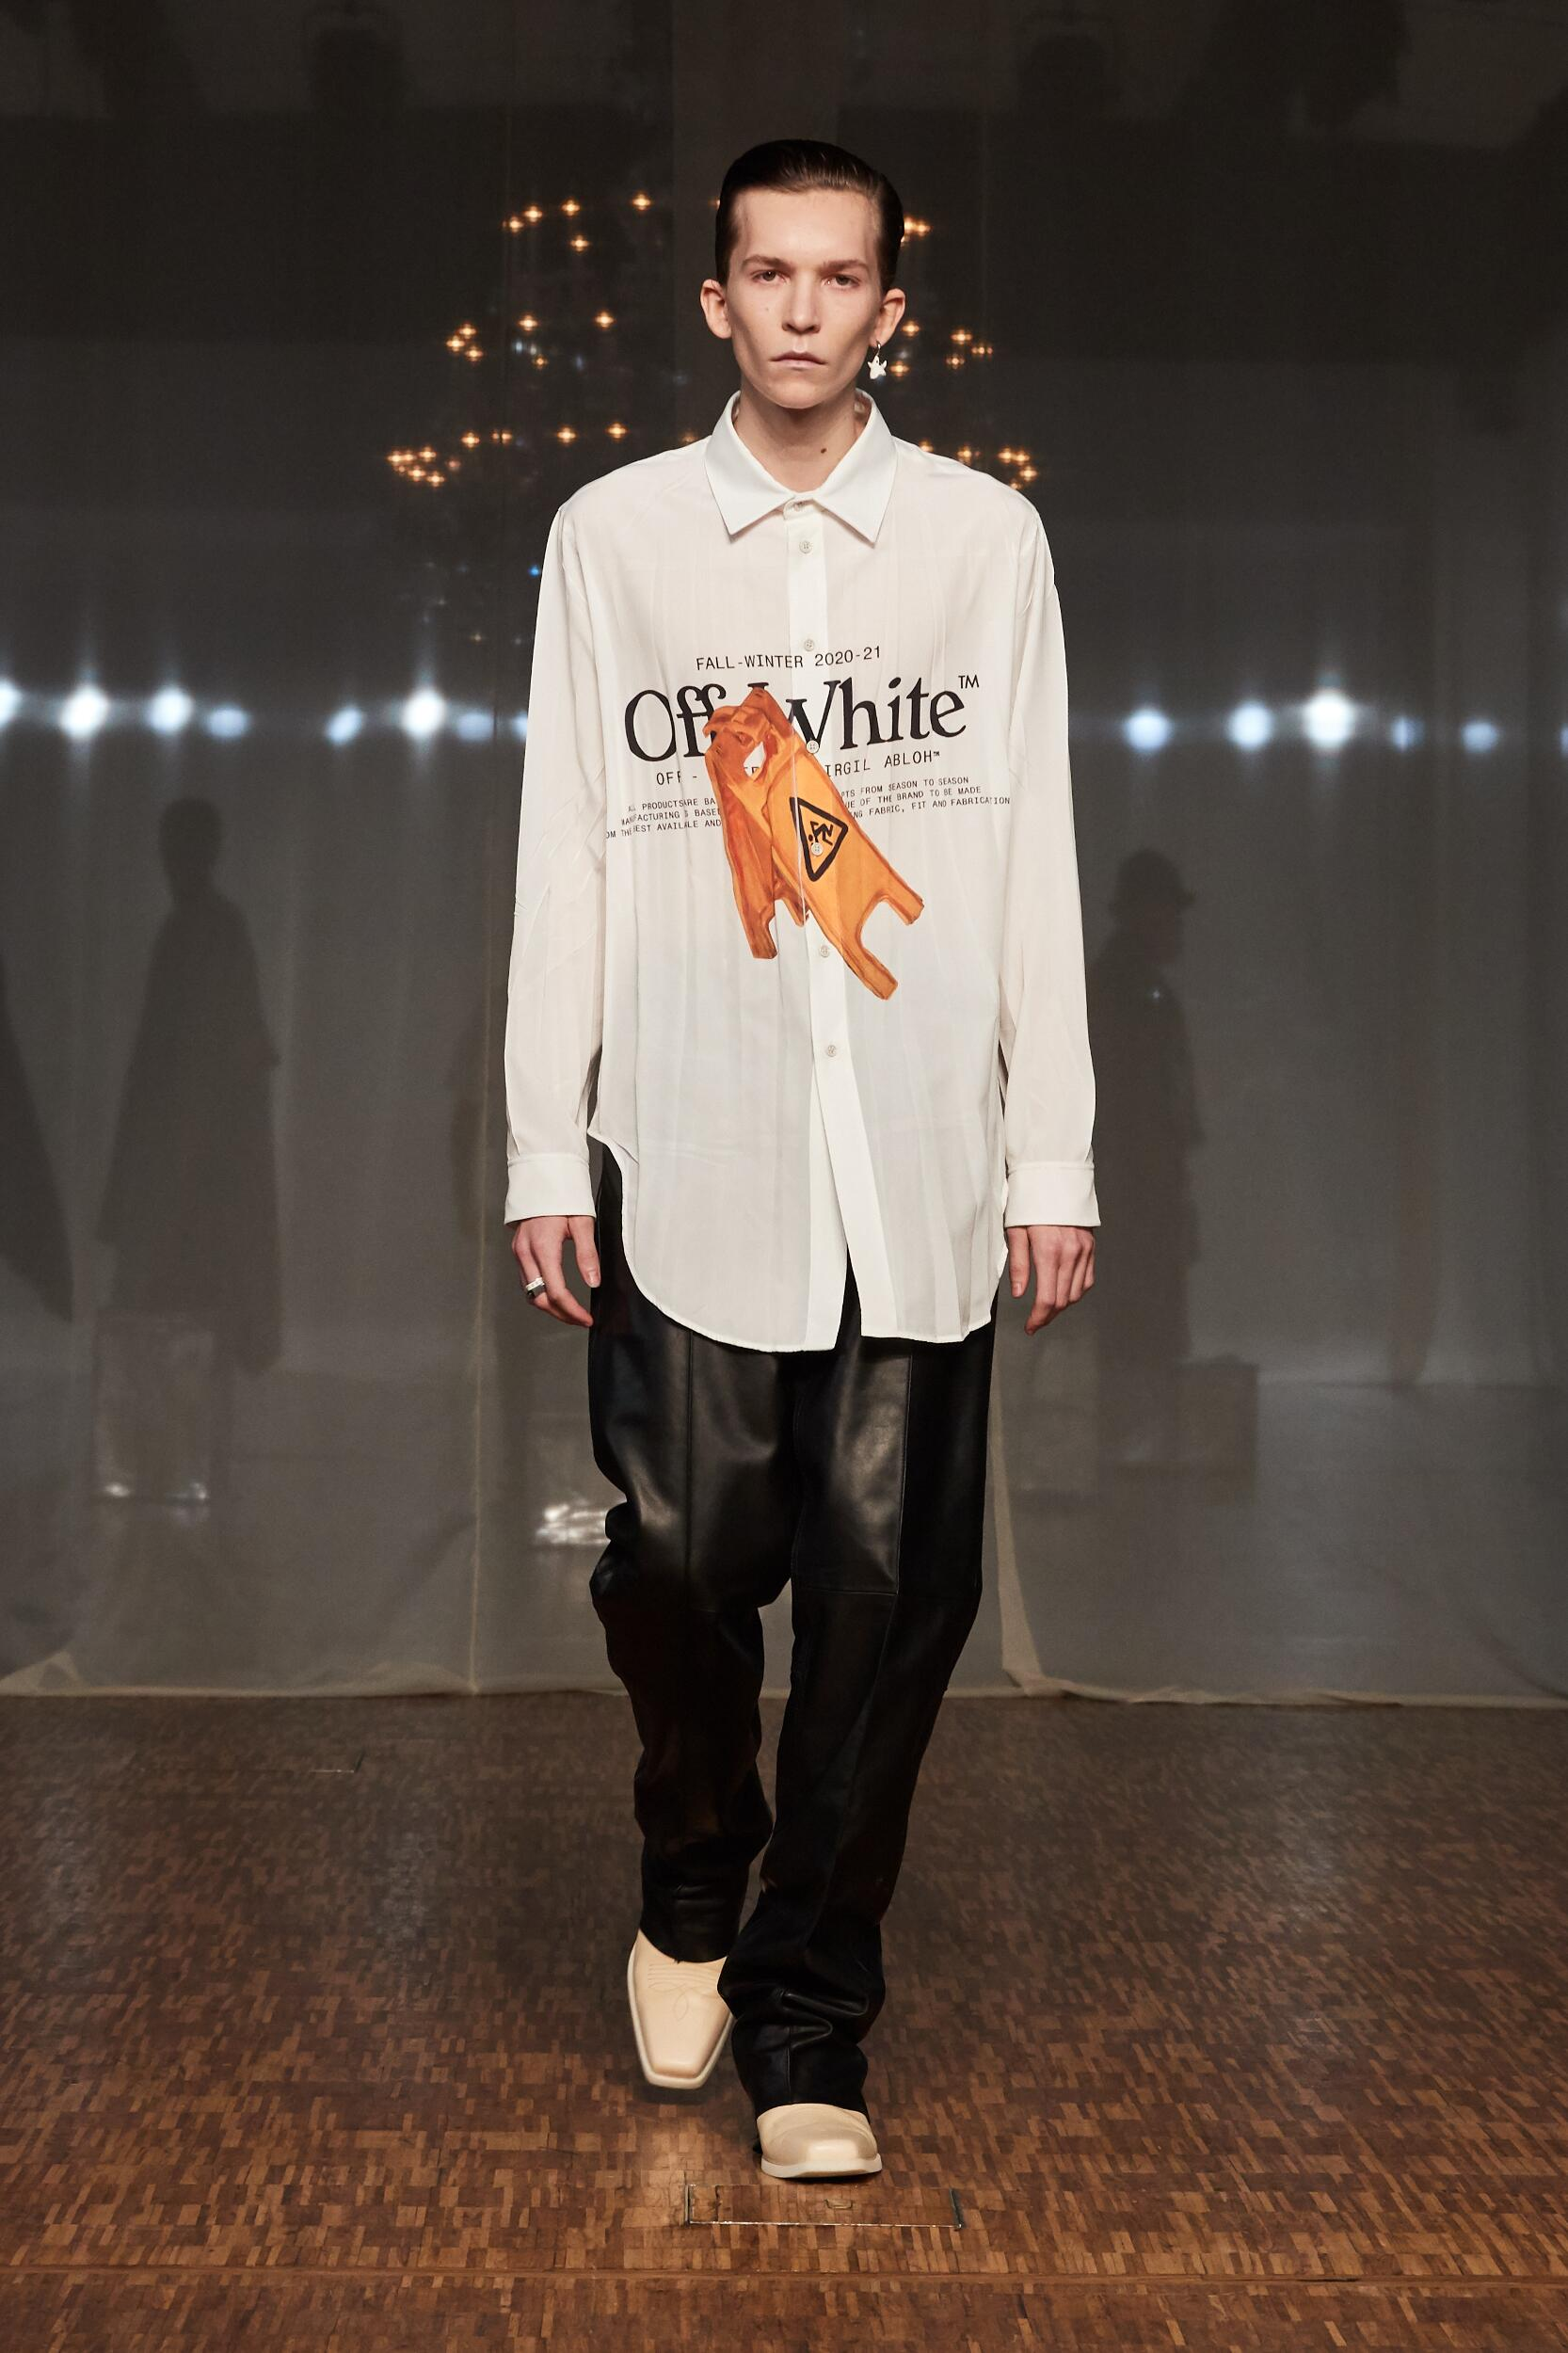 Off White c/o Virgil Abloh FW 2020 Menswear